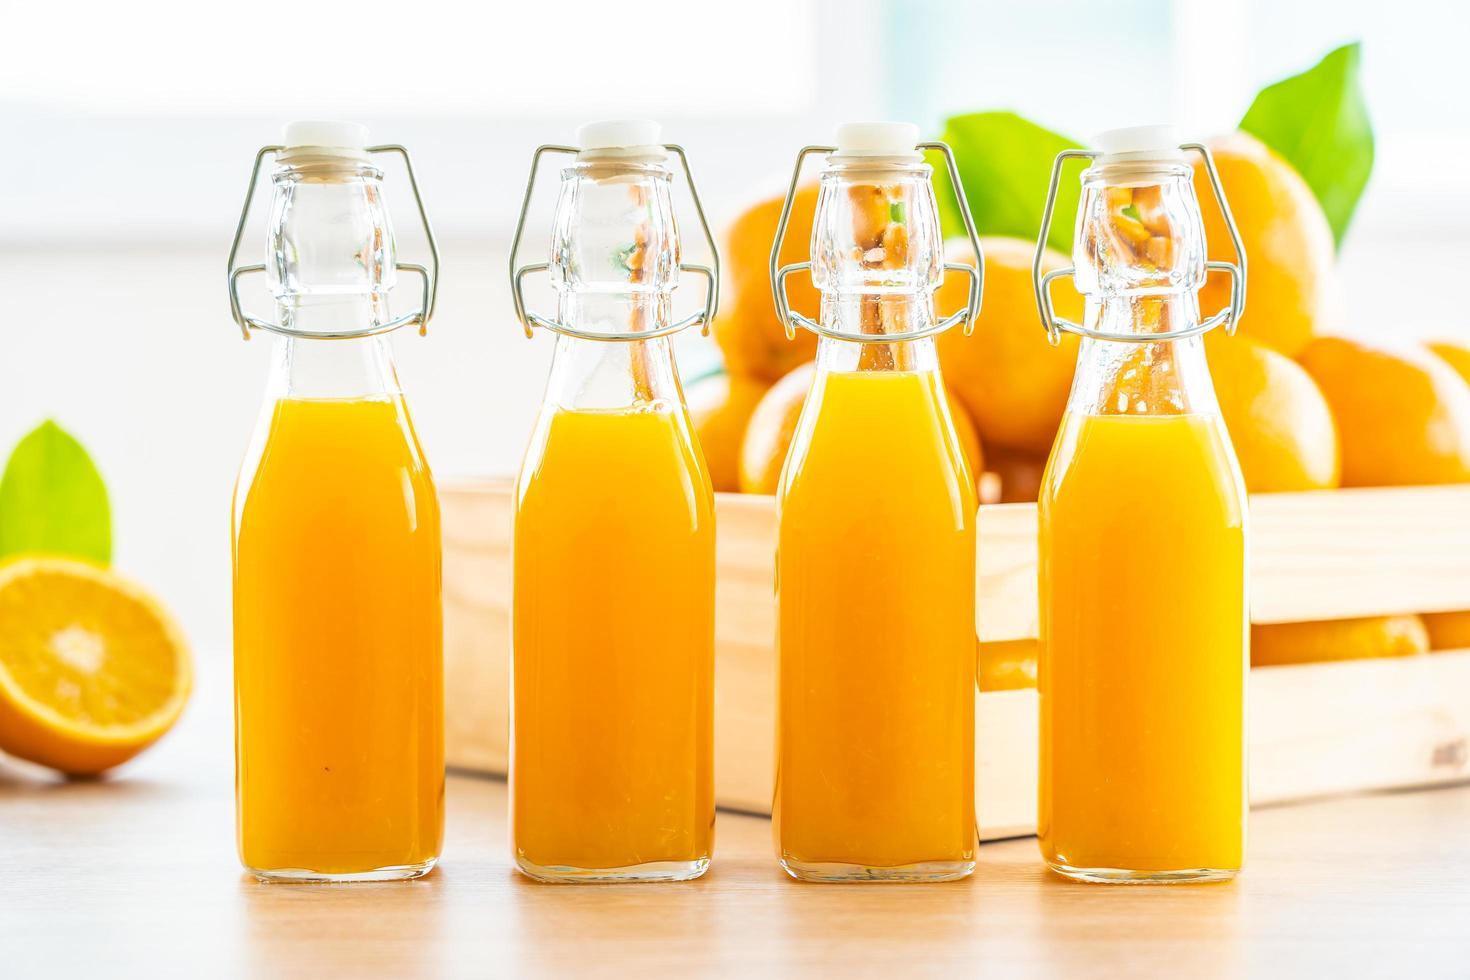 jus d'orange frais et oranges photo